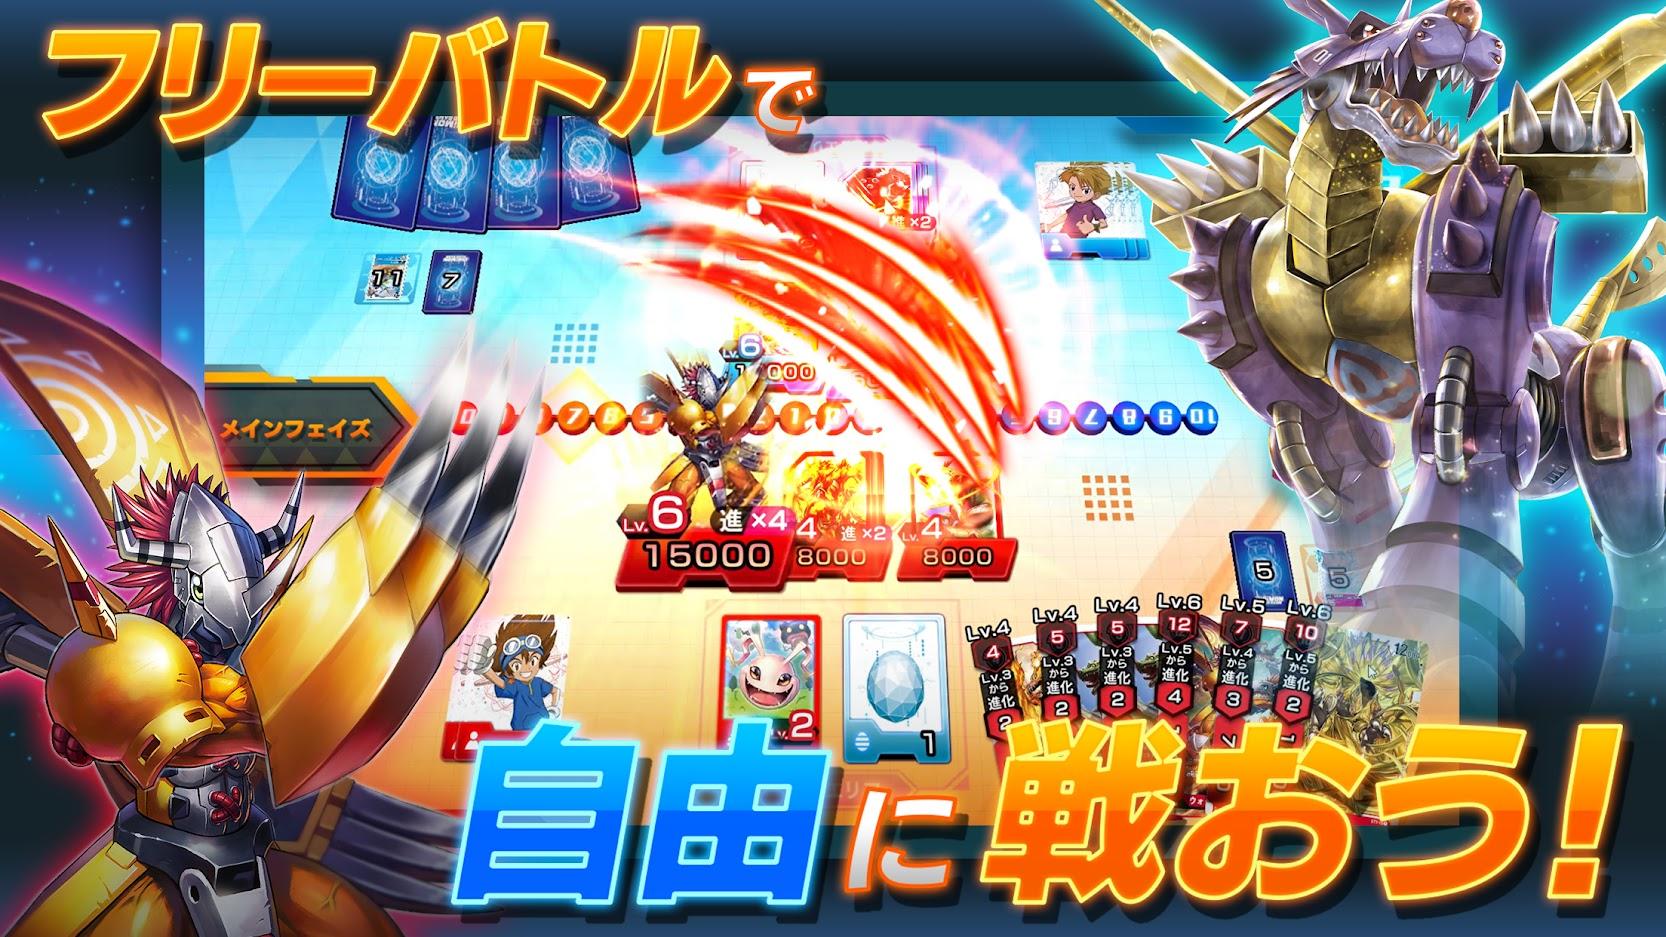 Digimon Card Game 2832020 1